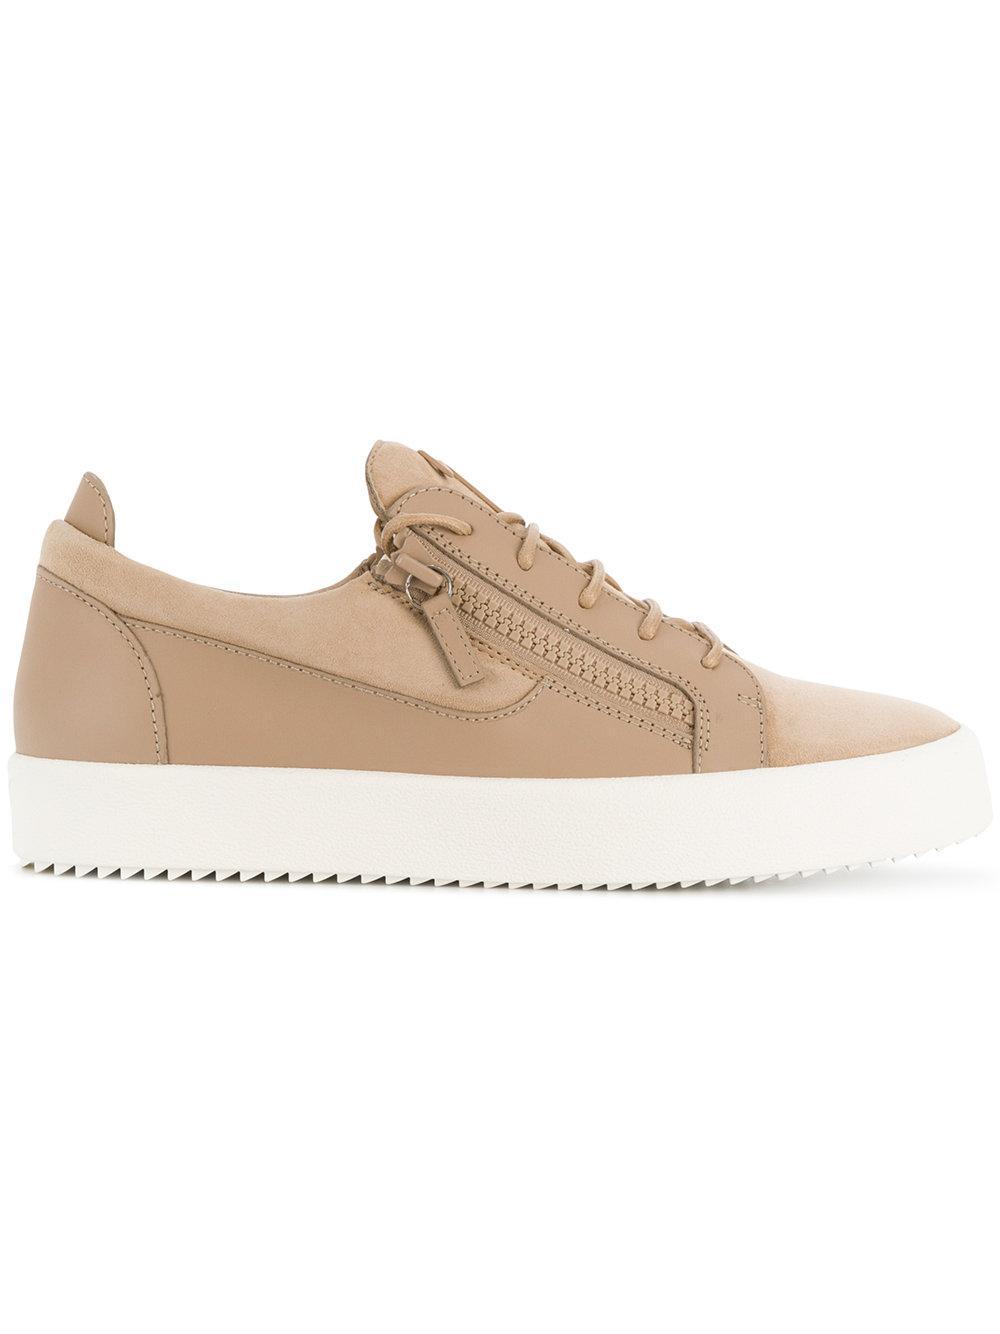 Giuseppe Zanotti Frankie Low Top Sneakers